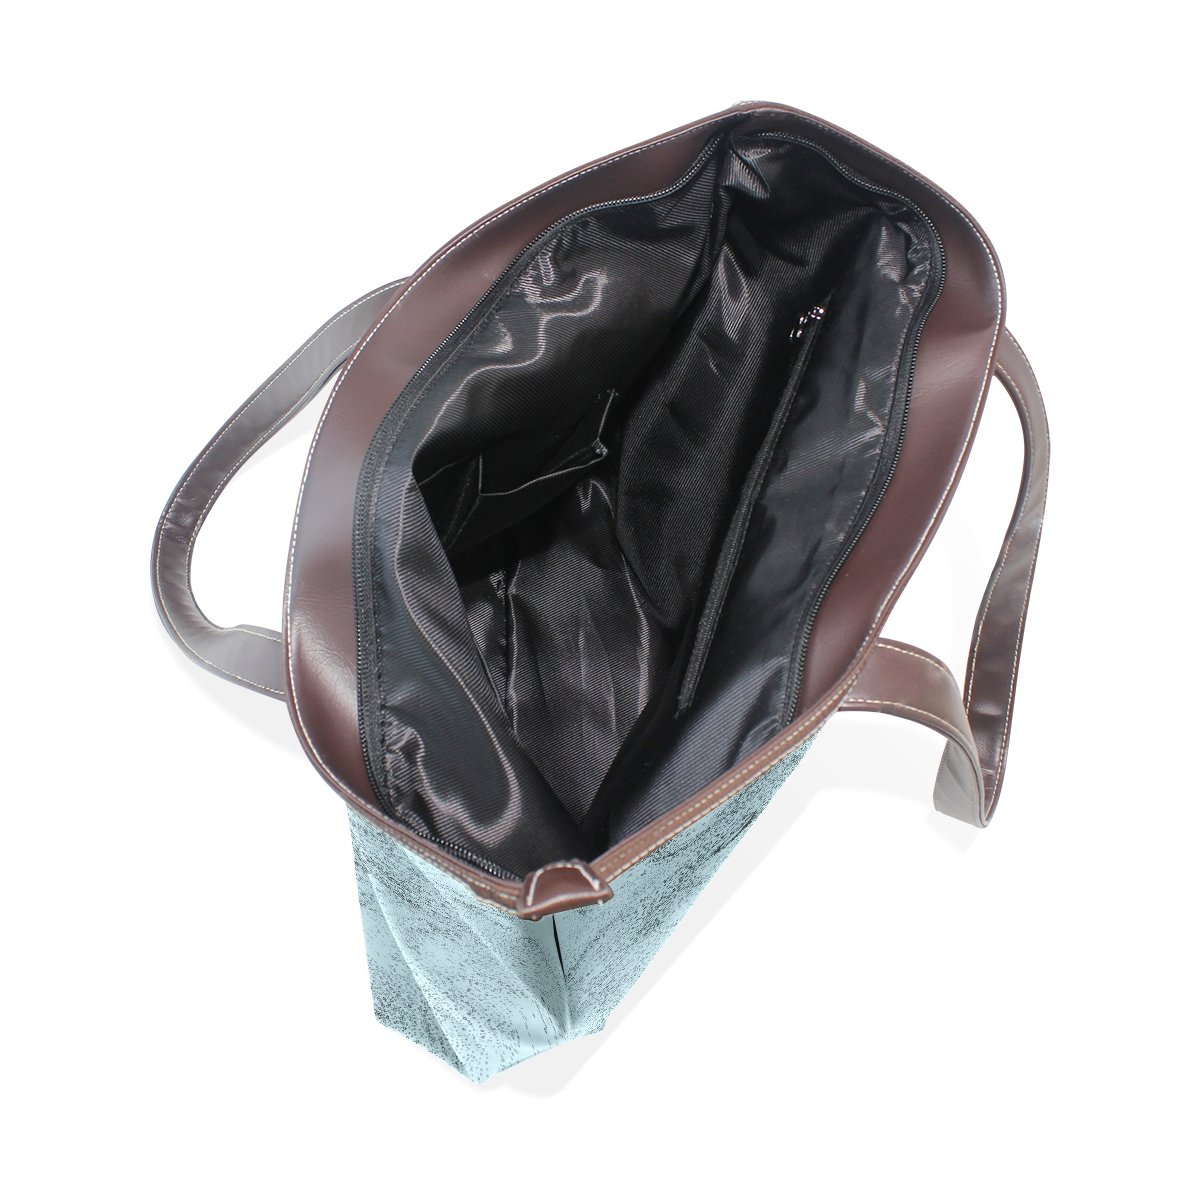 Ye Store Wolf Face Blue Flat Lady PU Leather Handbag Tote Bag Shoulder Bag Shopping Bag